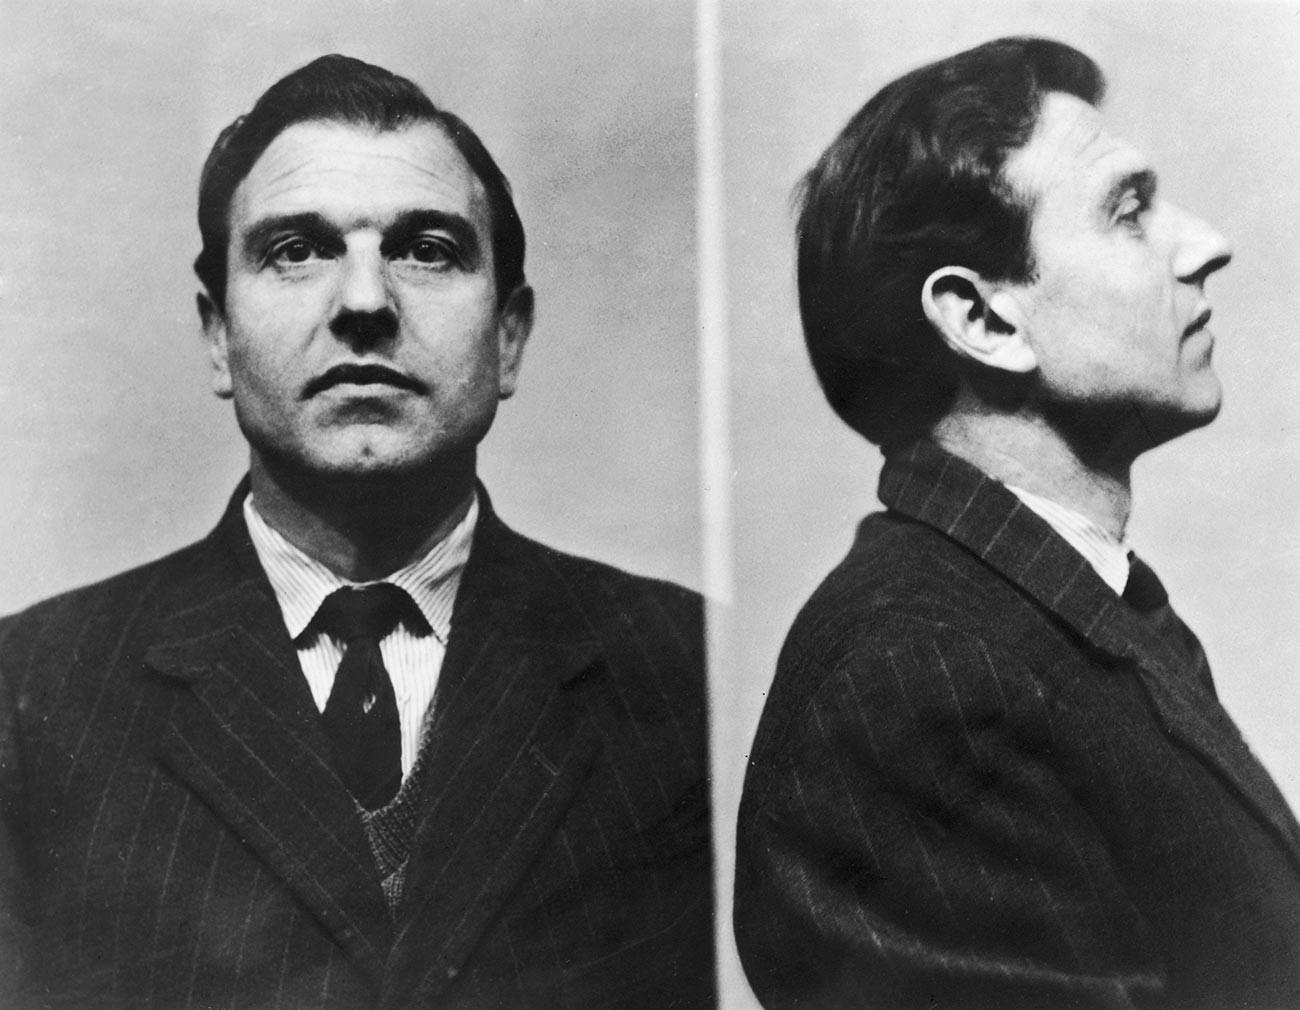 Фото Джорджа Блейка после ареста в 1961 году.